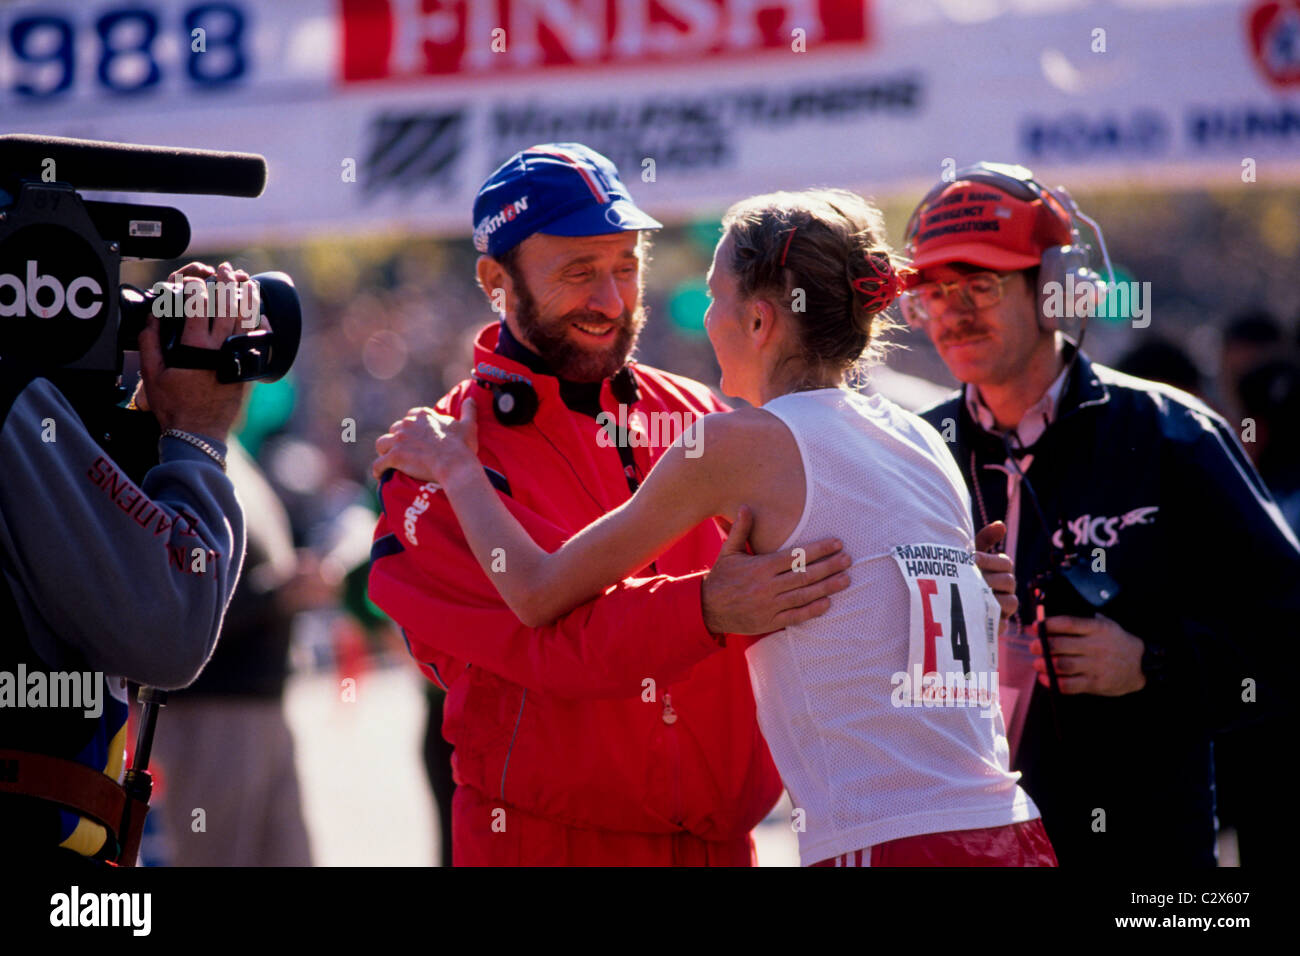 Fred Lebow with Grete Waitz at the 1988 NYC Marathon. - Stock Image